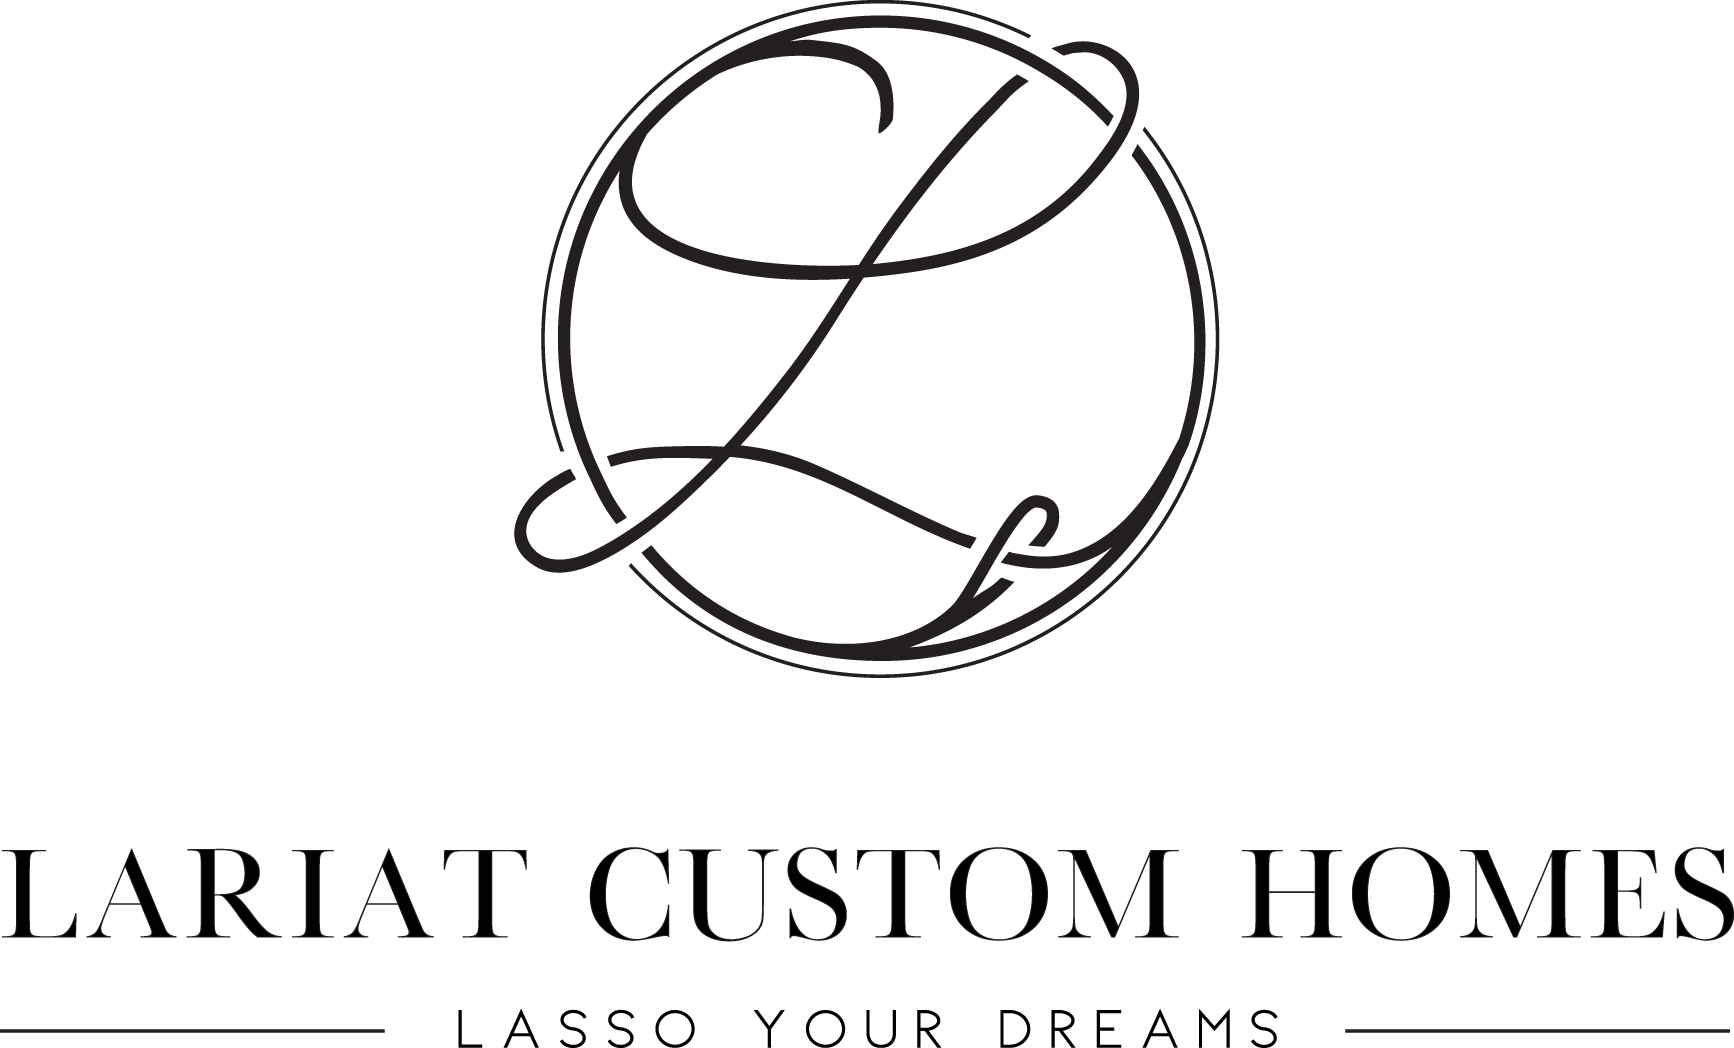 Lariat_LogoFull.jpg